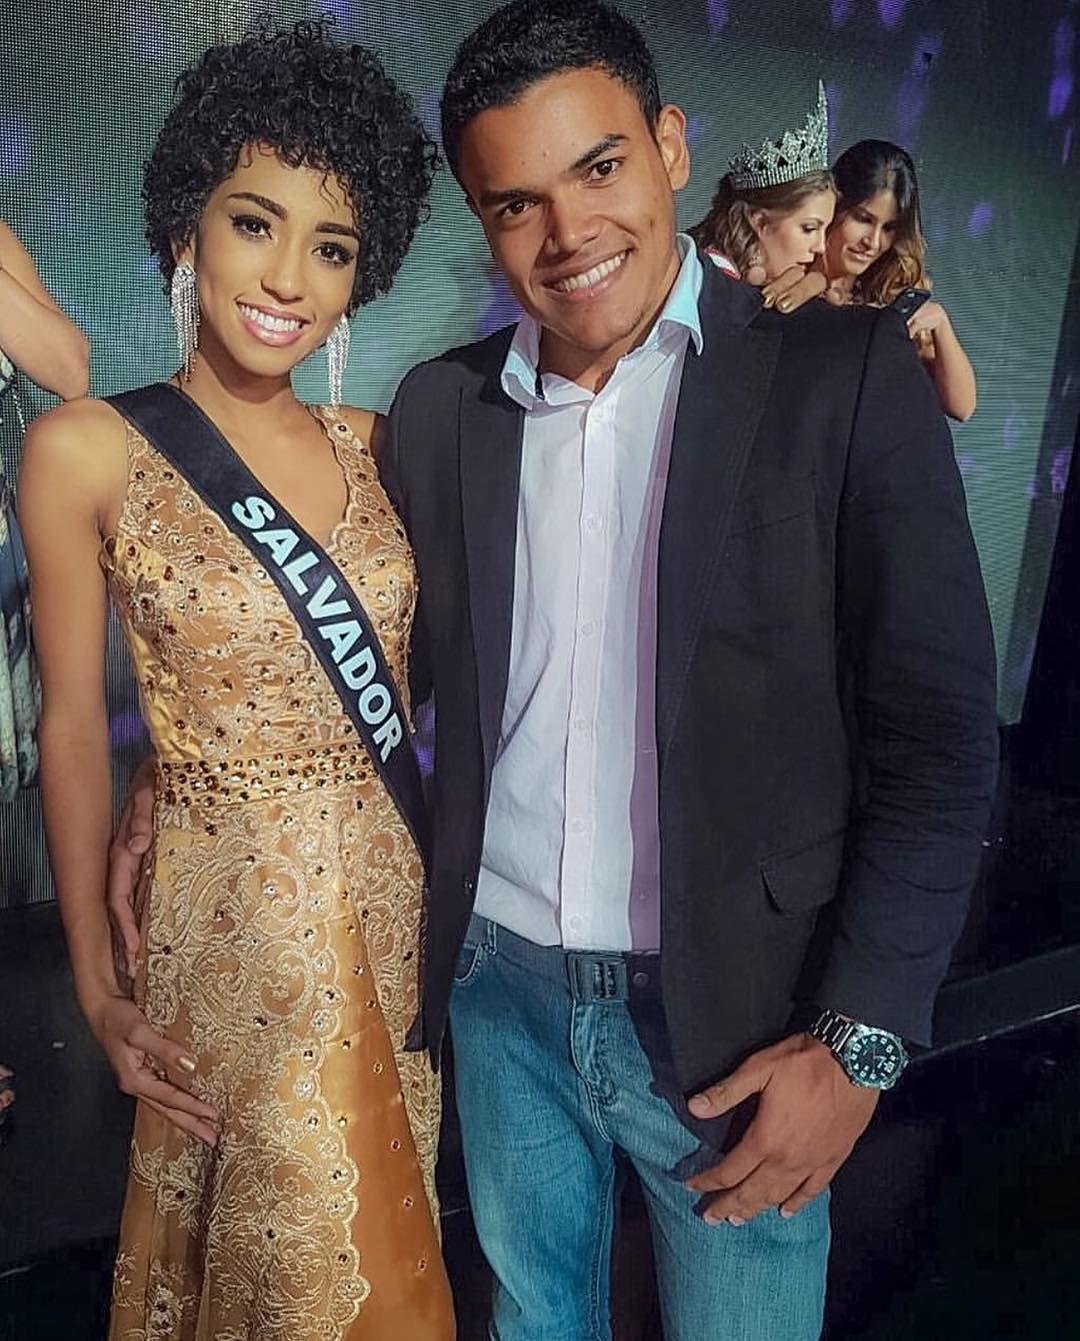 victoria esteves, miss bahia universo 2016. Tno4j24w